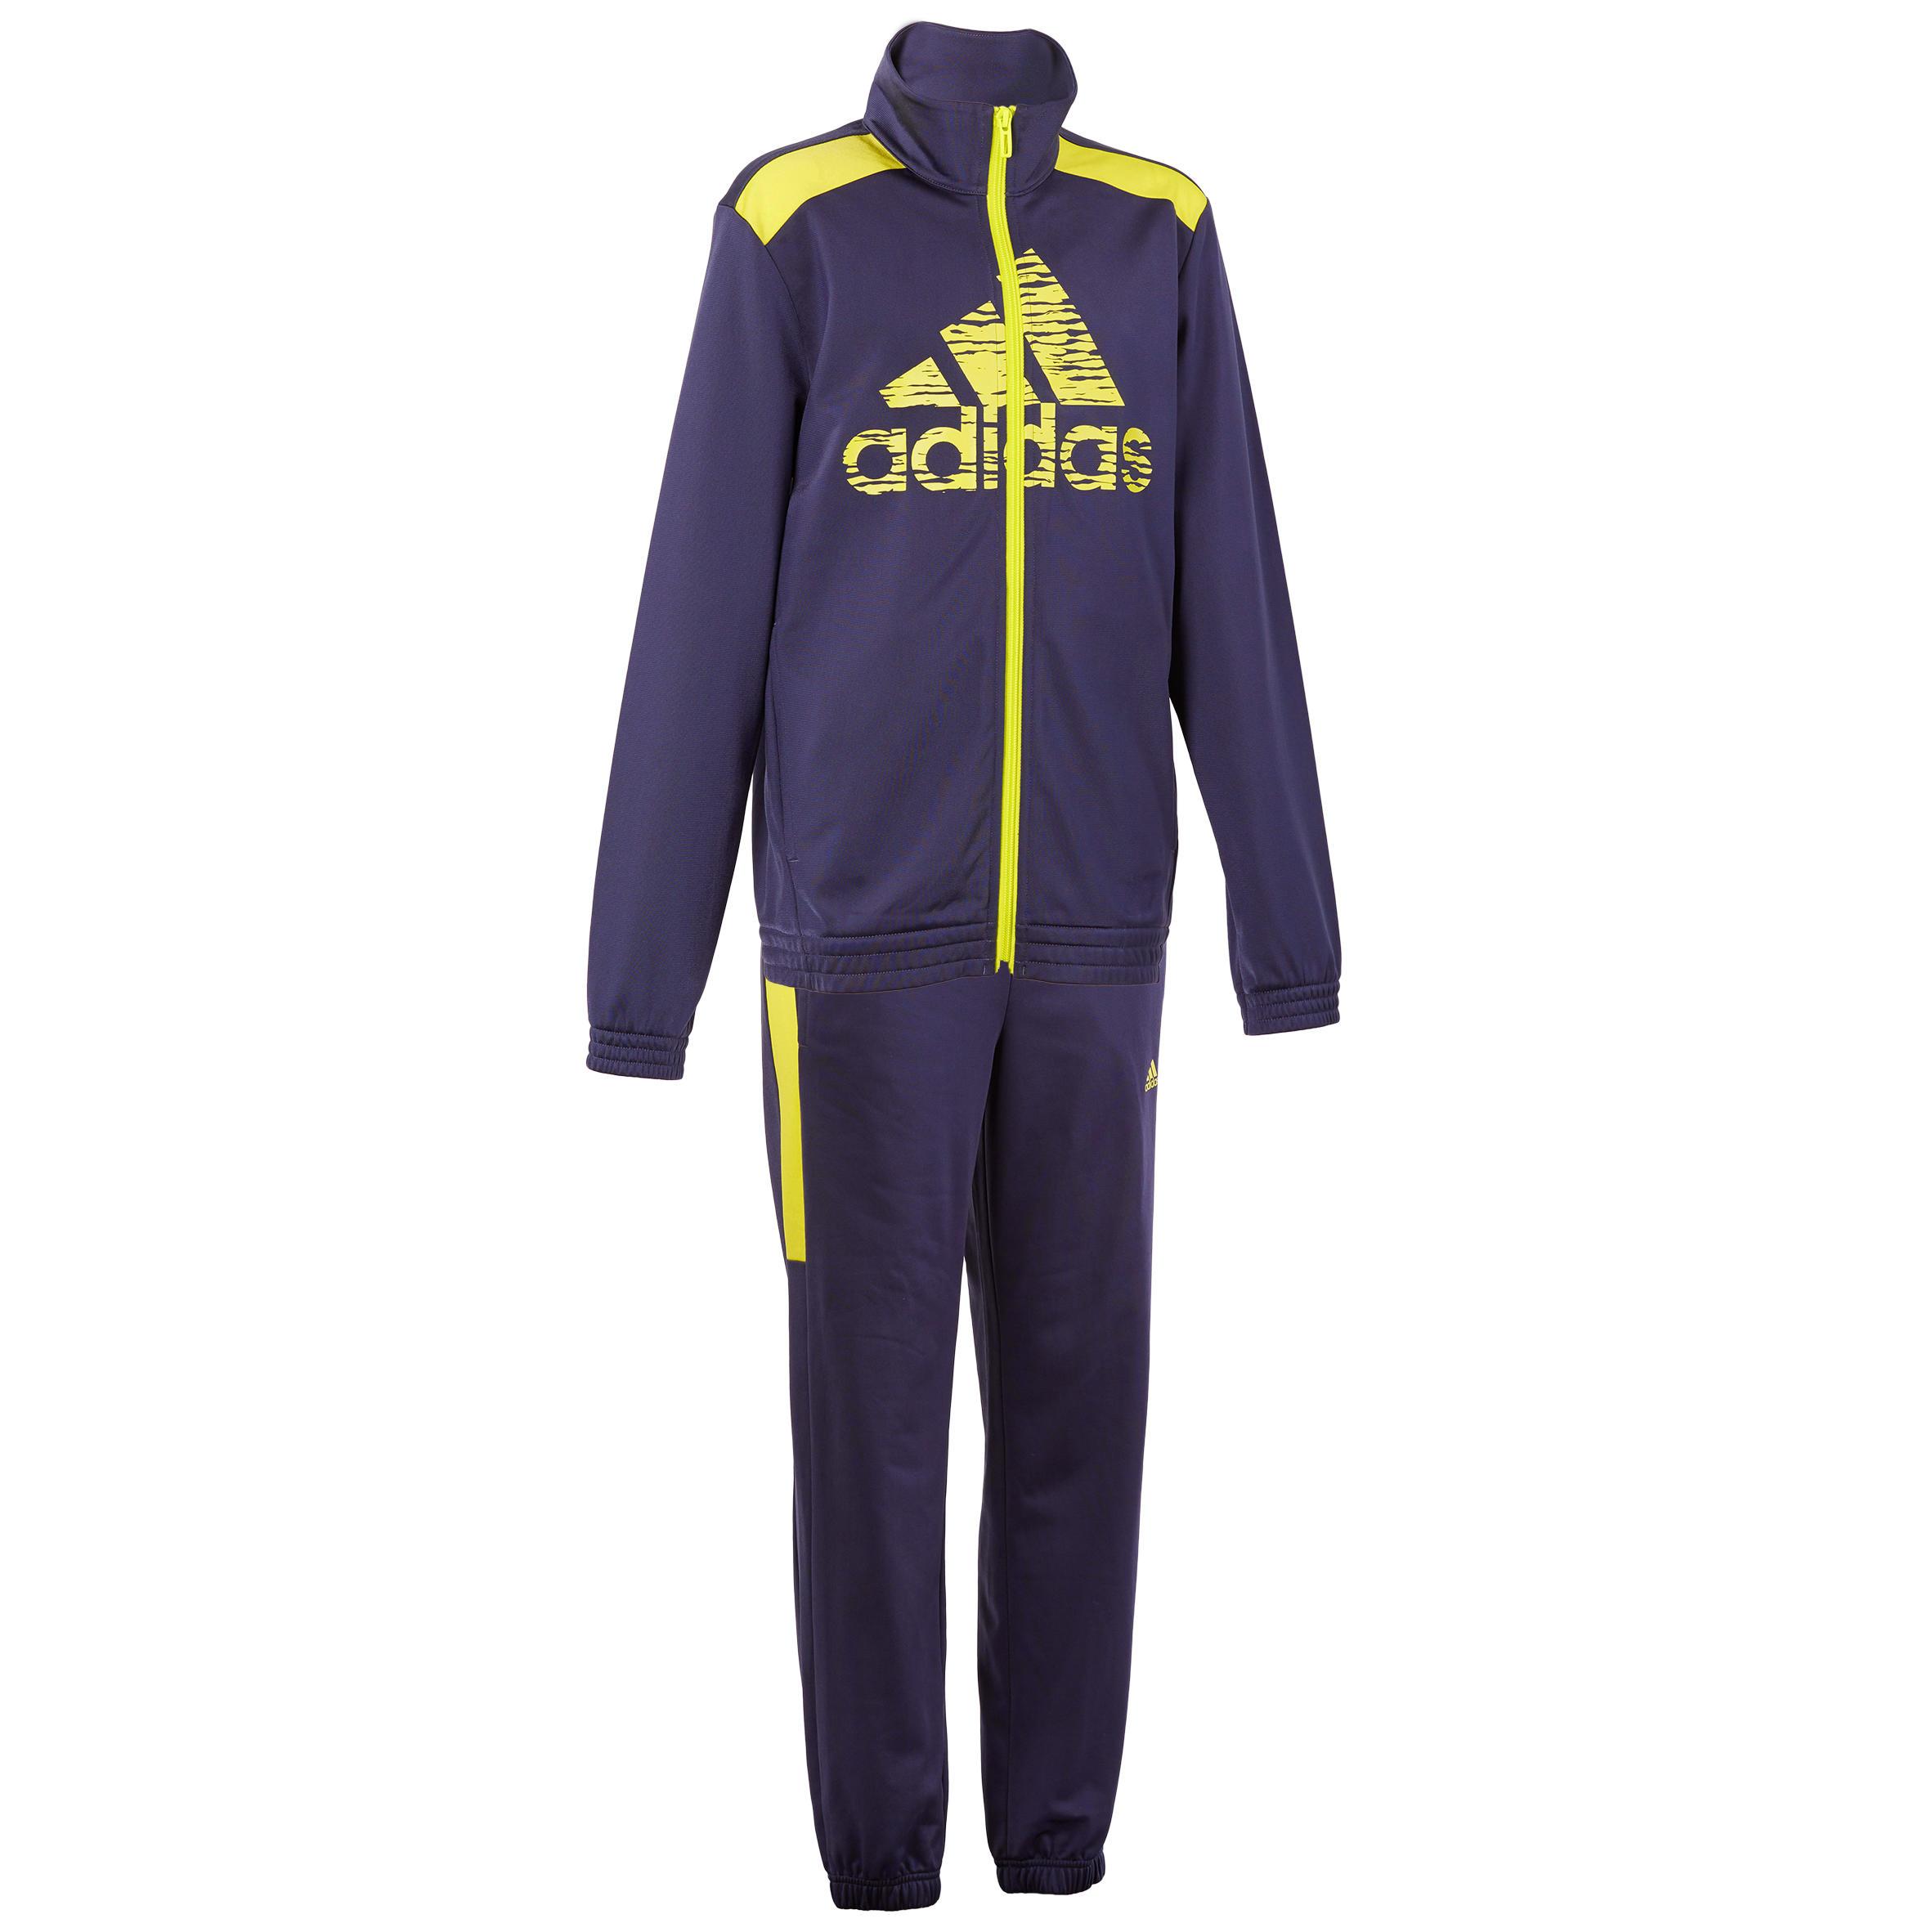 Adidas Trainingspak gym jongens blauw